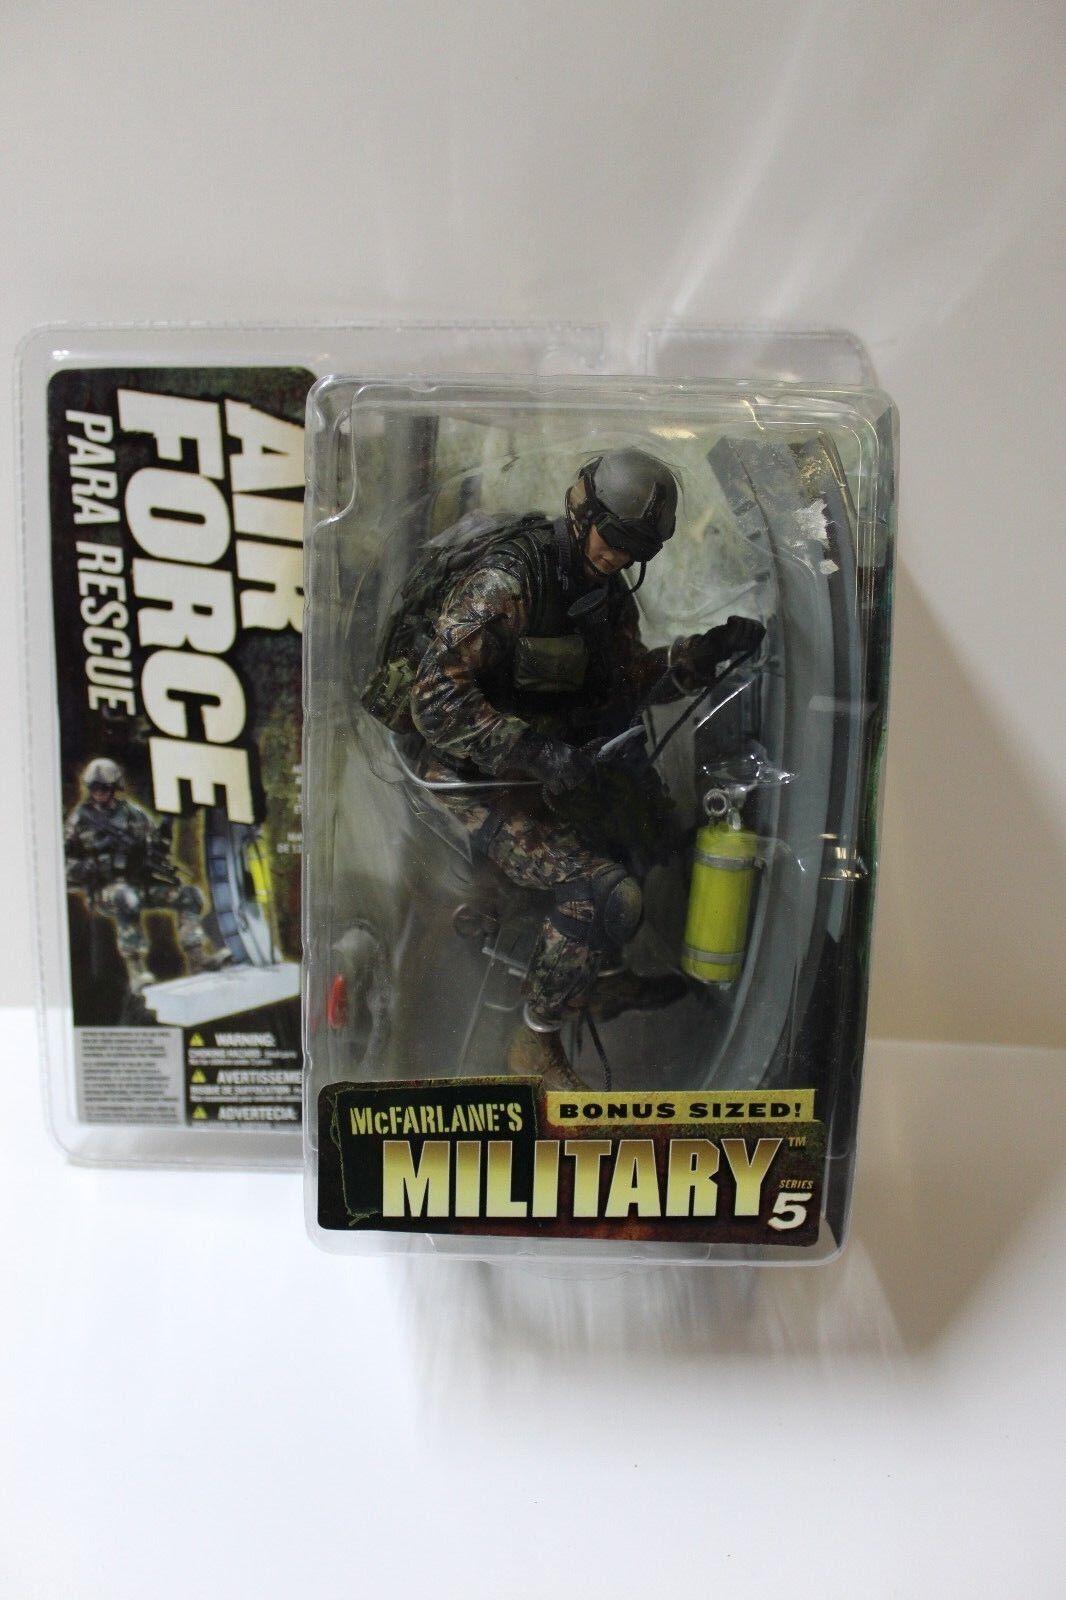 McFarlane Military Series 5 Air Force Para rescue figurine livraison gratuite